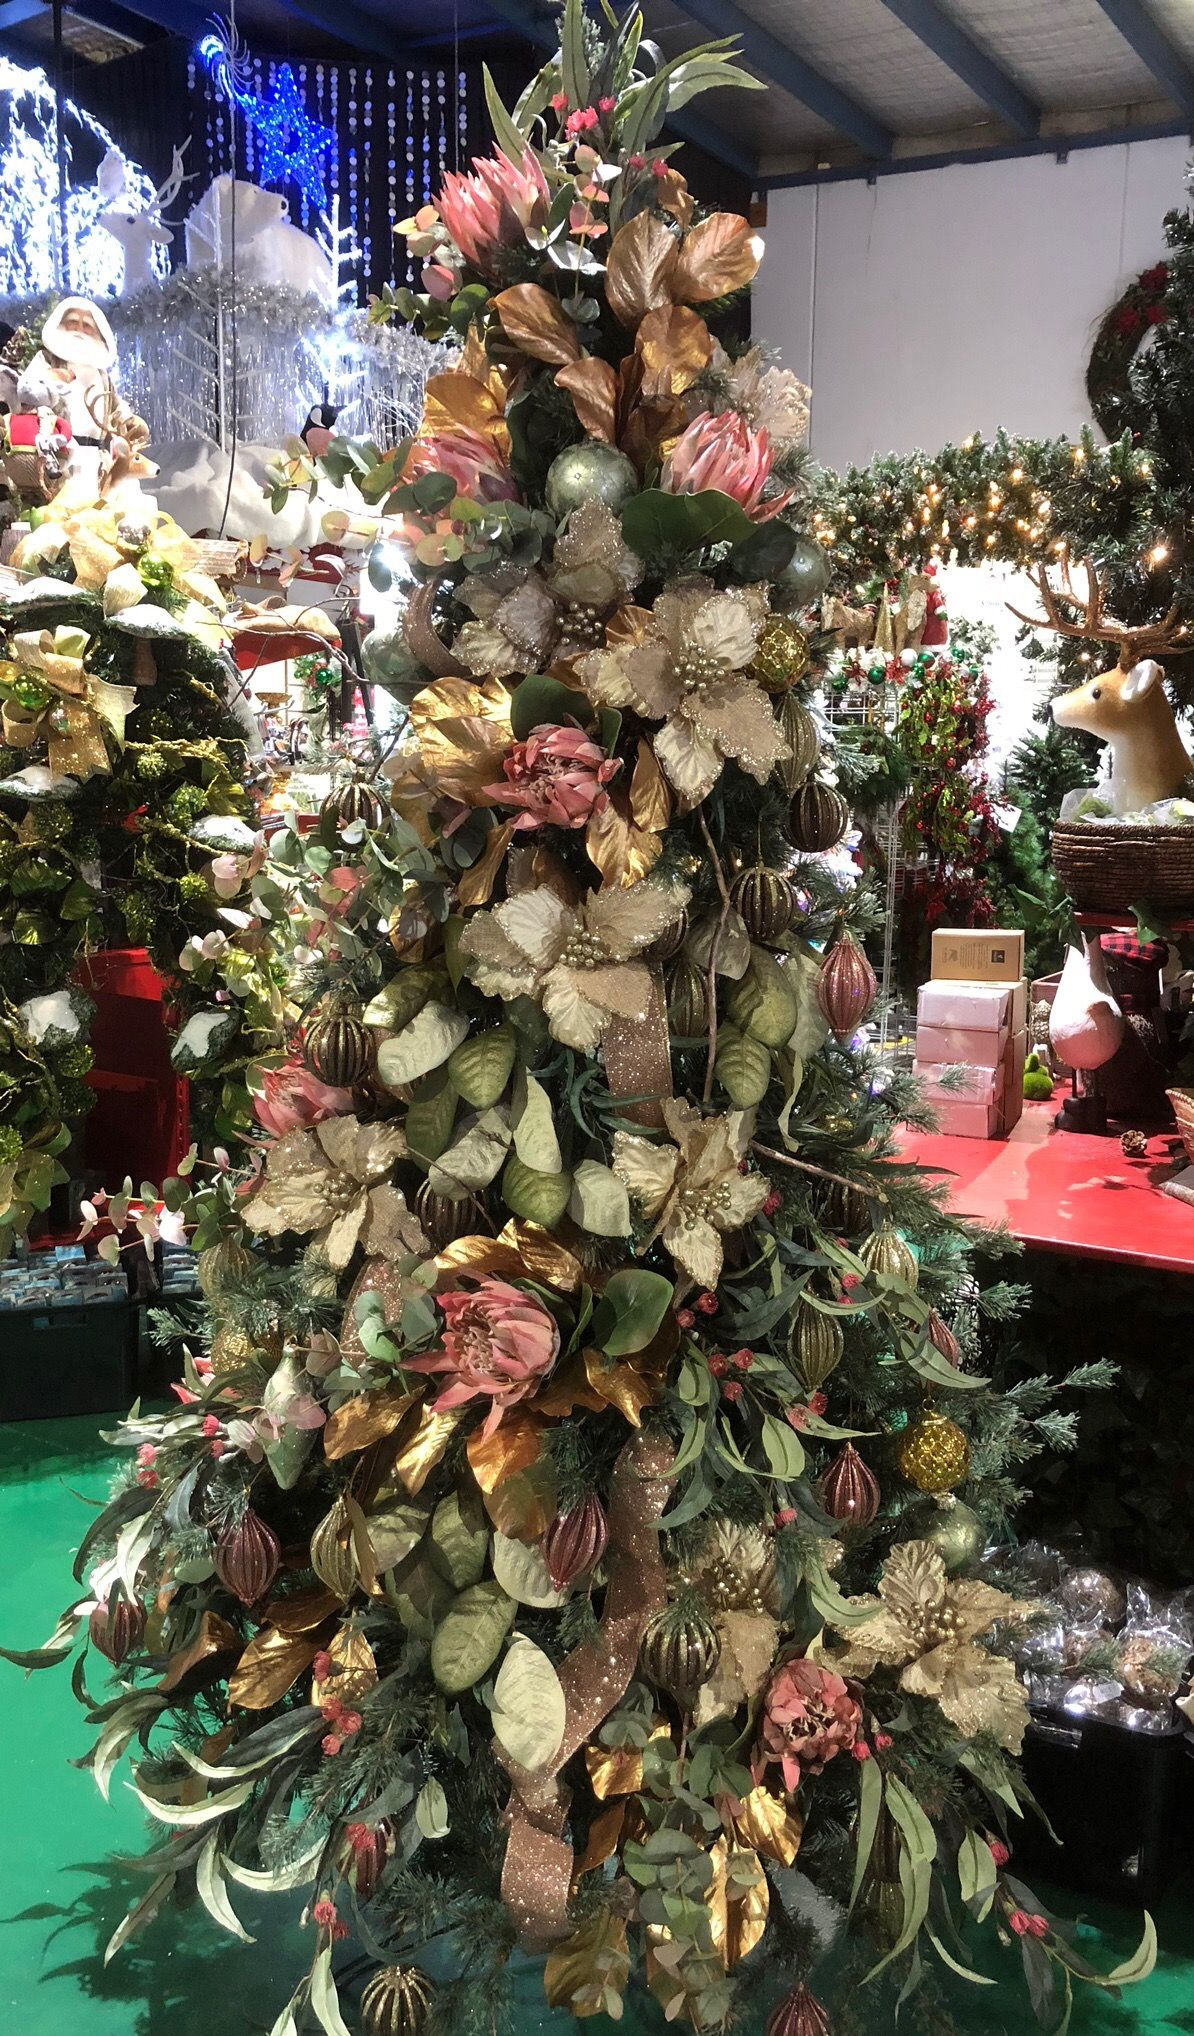 Australian Christmas Tree For 2018 Christmas Decorations Xmas Trees Australian Christmas Tree Christmas Floral Arrangements